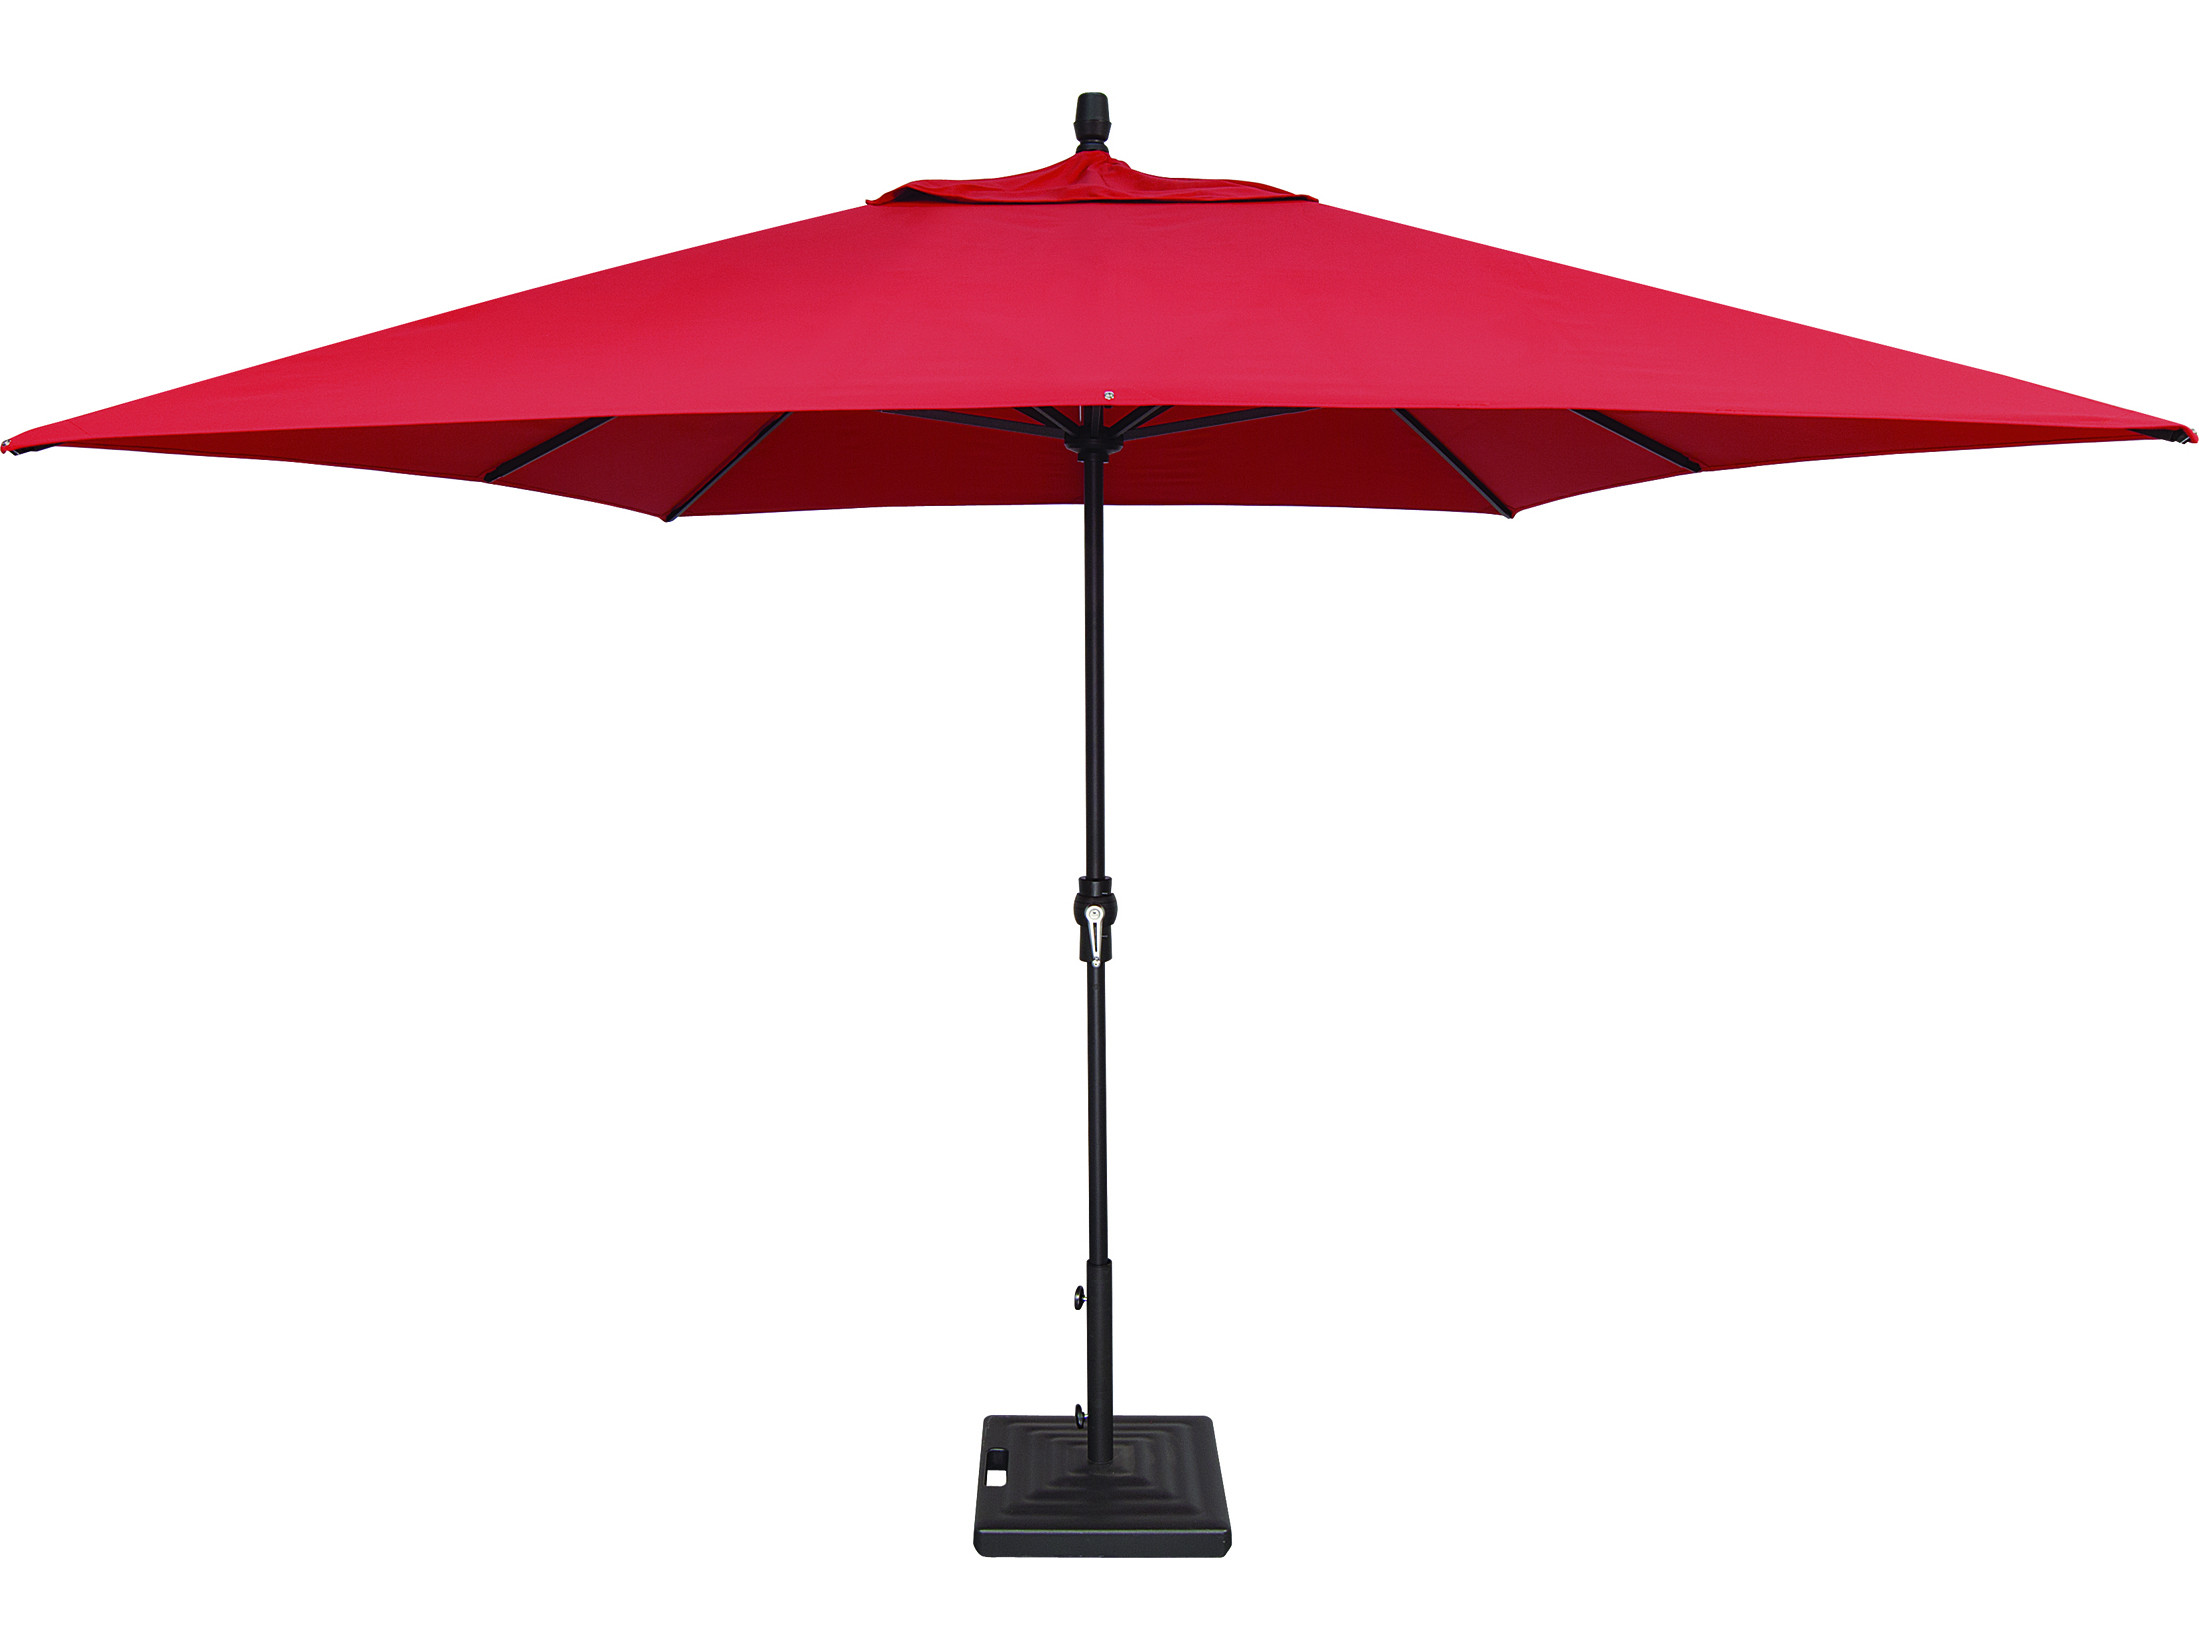 Best ideas about Patio Umbrella Walmart . Save or Pin Treasure Garden Market Aluminum 8 x 11 Crank Lift Now.